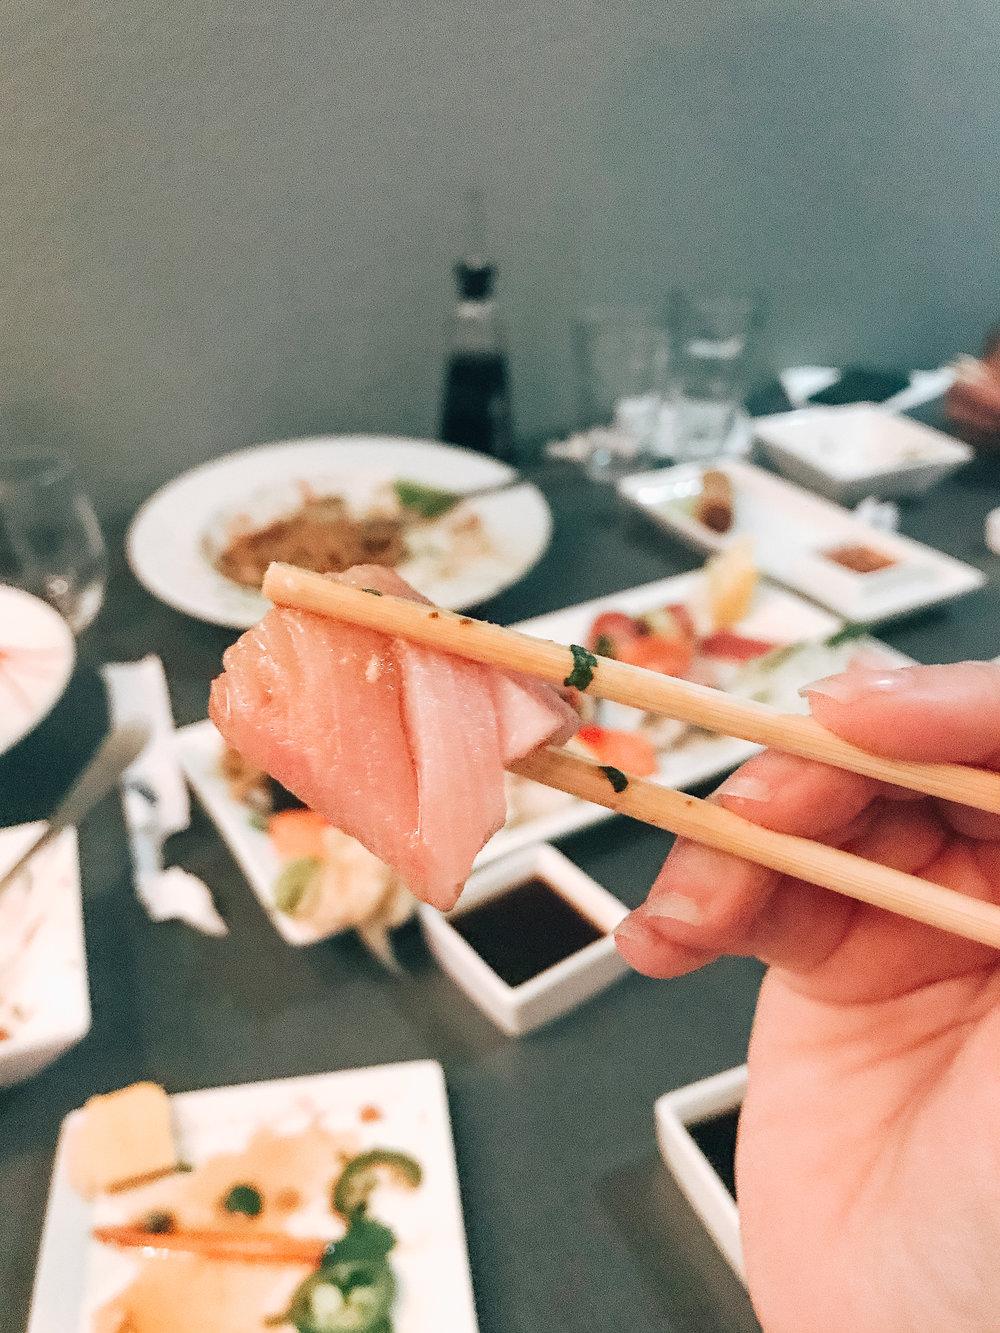 pensacola sushi restaurant